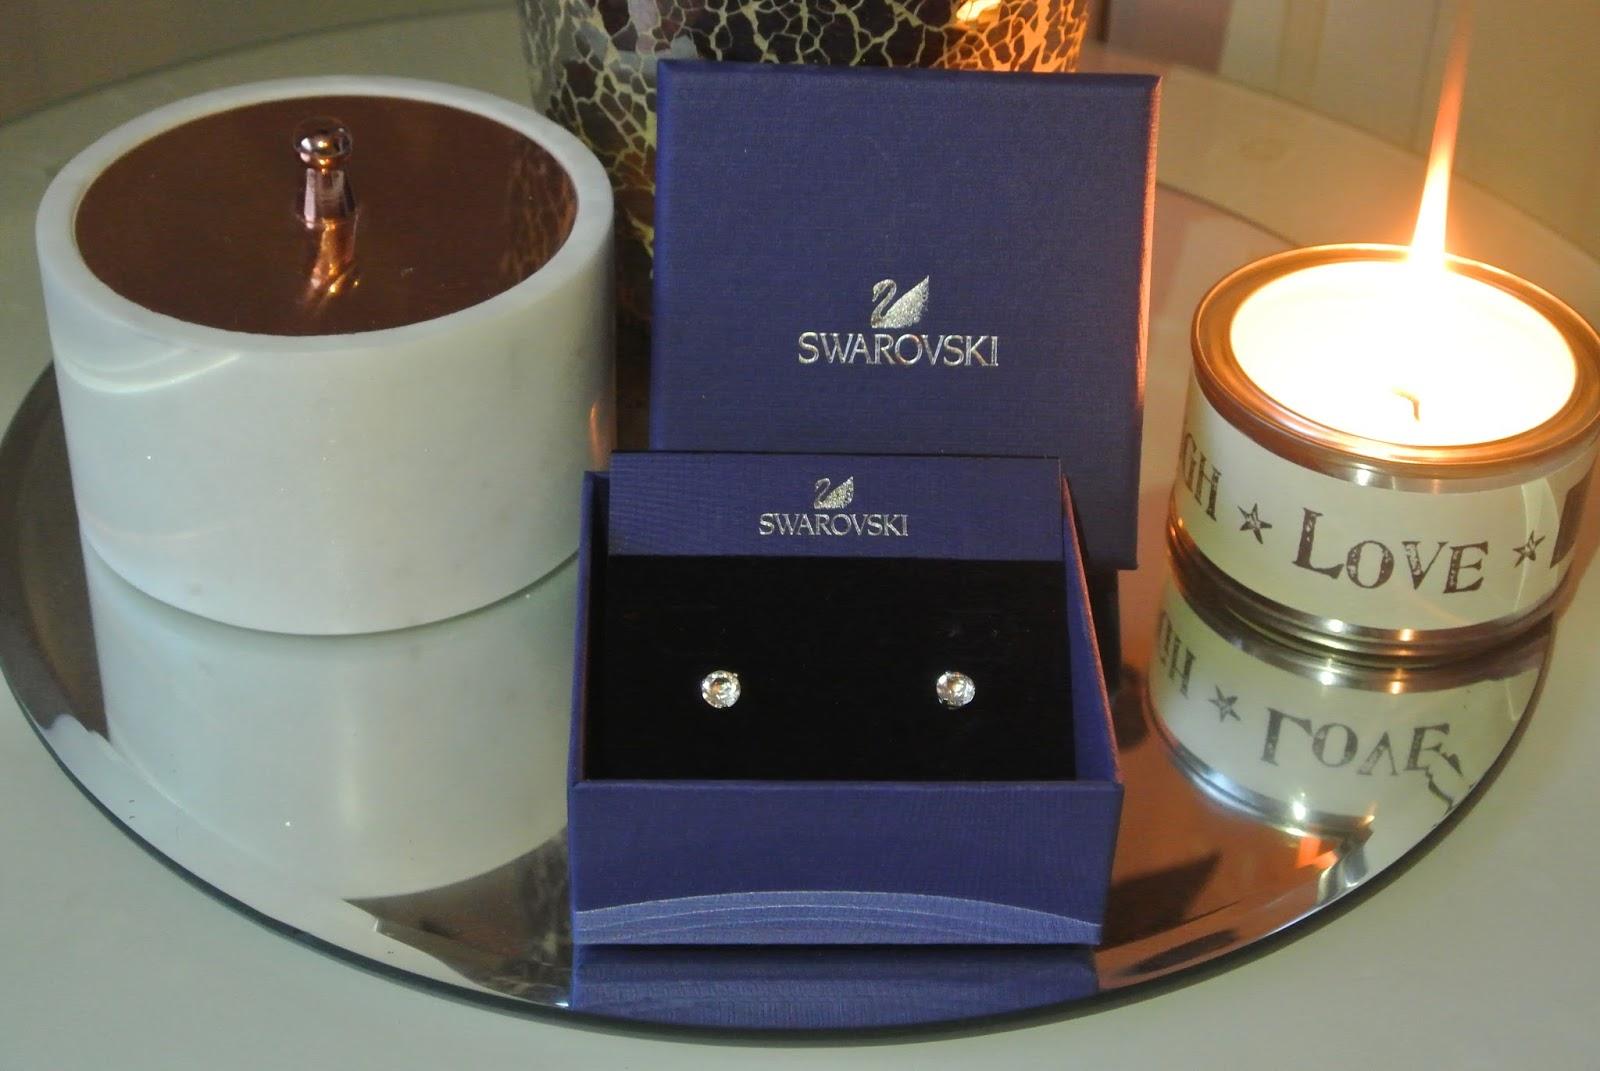 Swarovski Solitaire Stud Earrings from Jewel Hut Image